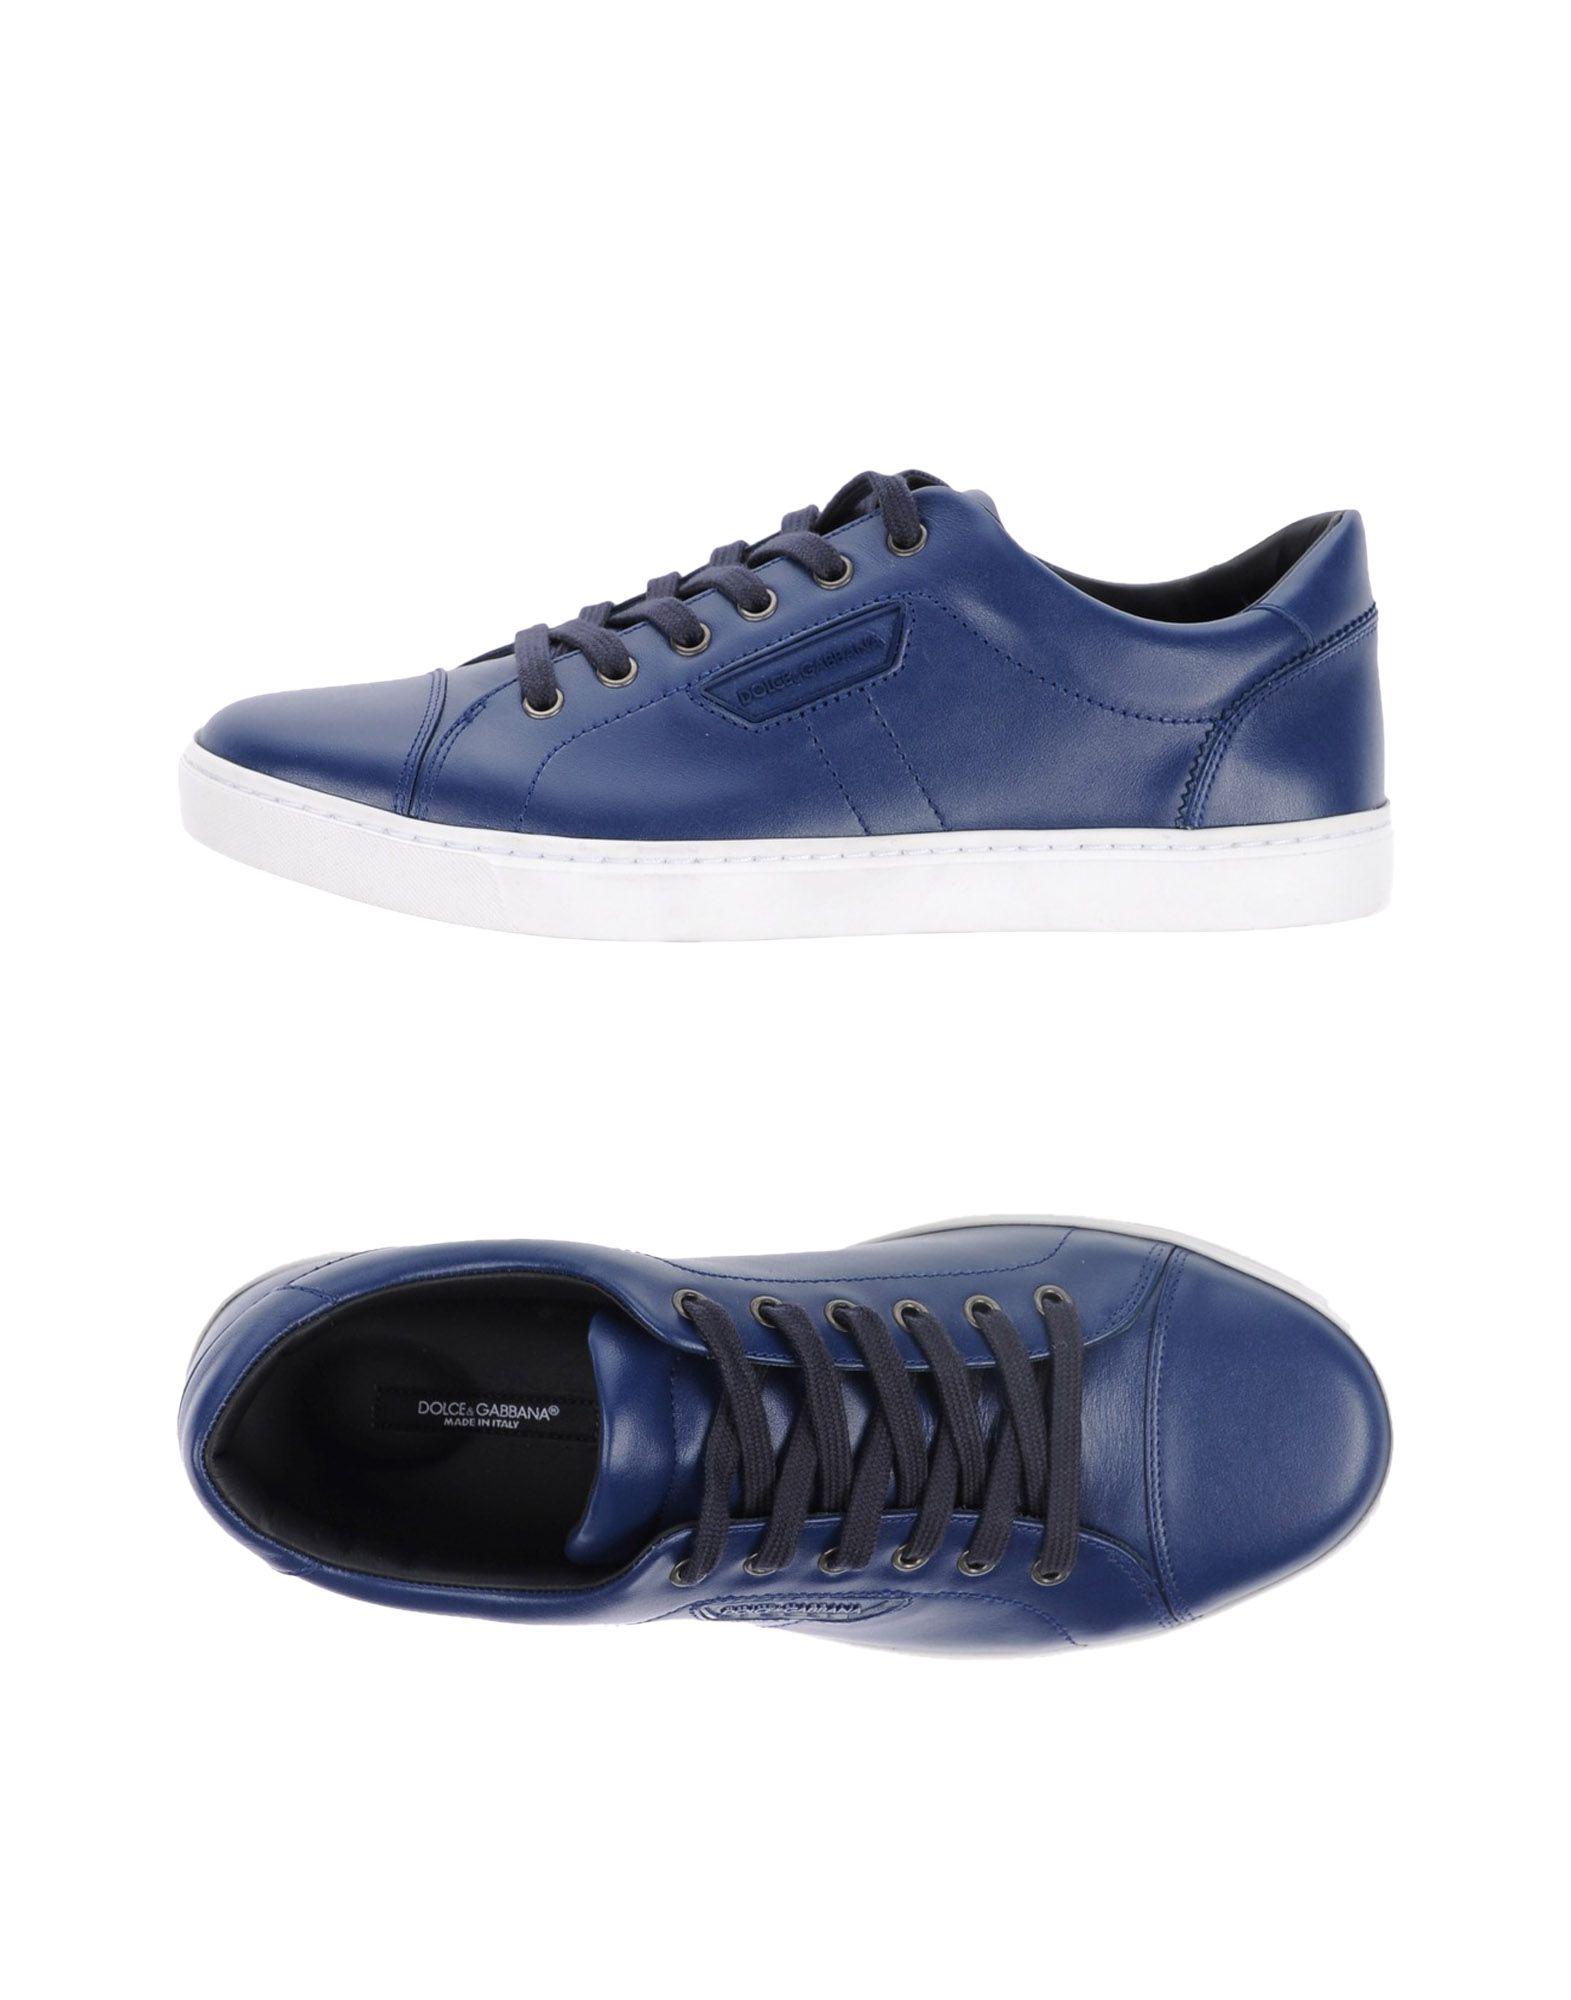 db378edafbf0f Dolce   Gabbana Sneakers - Men Dolce   Gabbana Sneakers online on YOOX  United Kingdom - 11027650IM